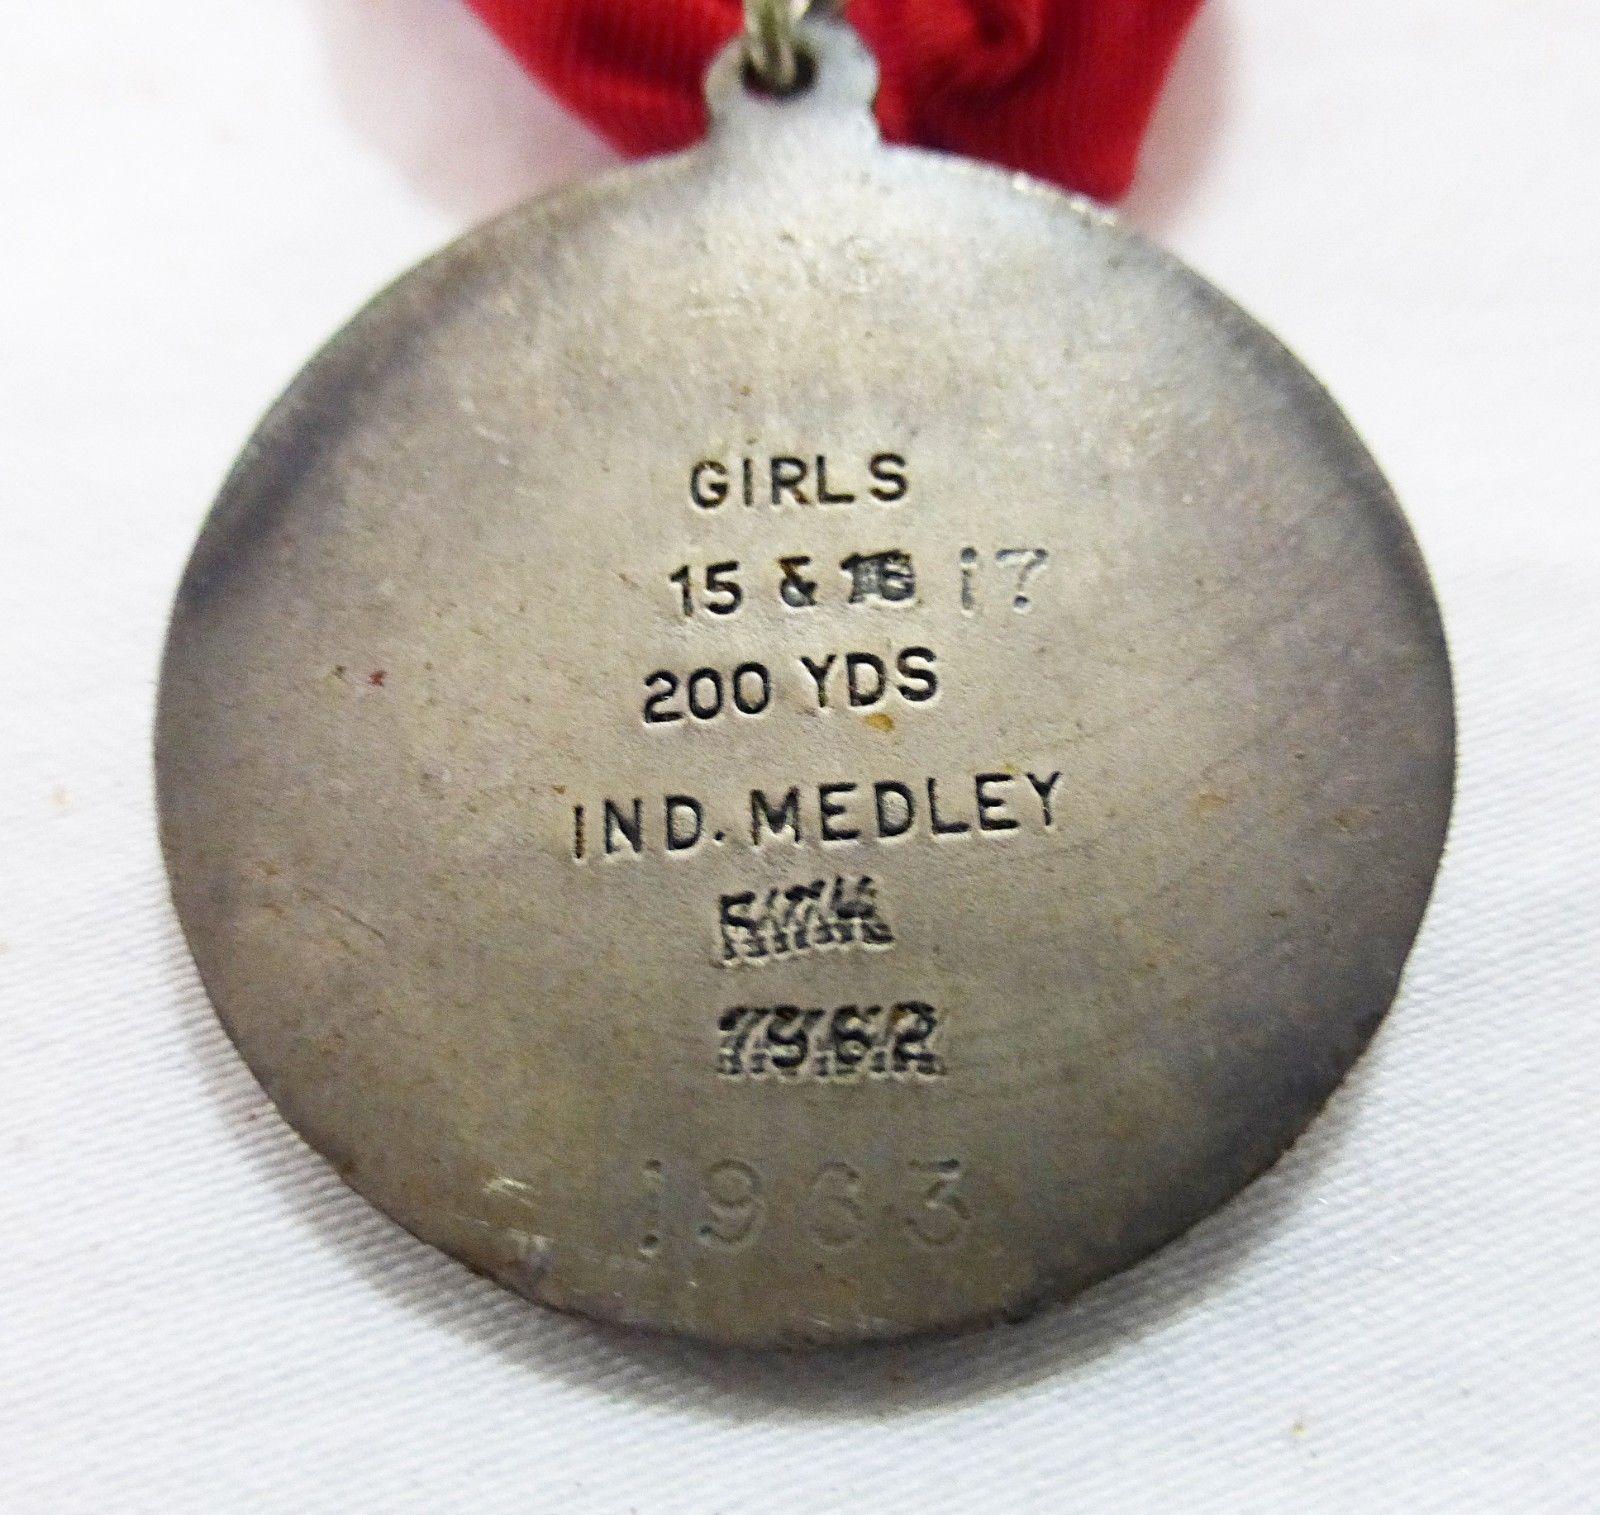 Vintage 1963 JR olympics medal girls short course 200yrd swimming sport